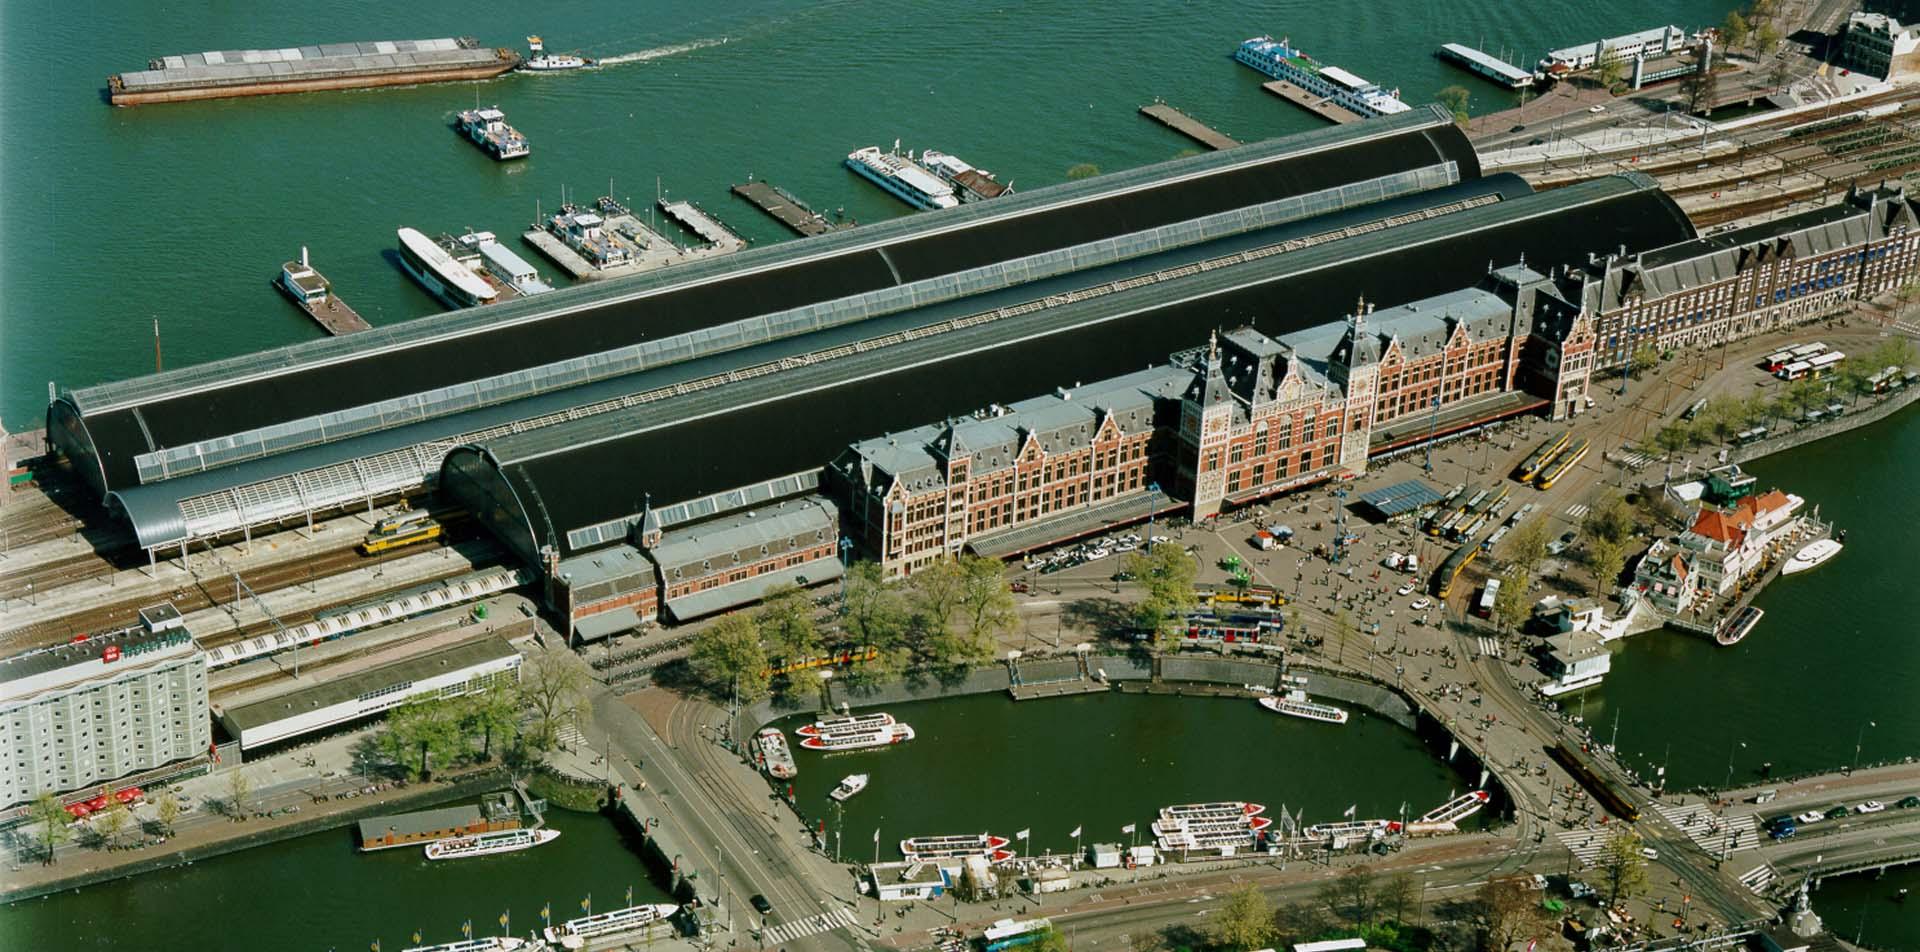 station-amsterdam-cs-amsterdam-ontworpen-door-architect-studiosk-0